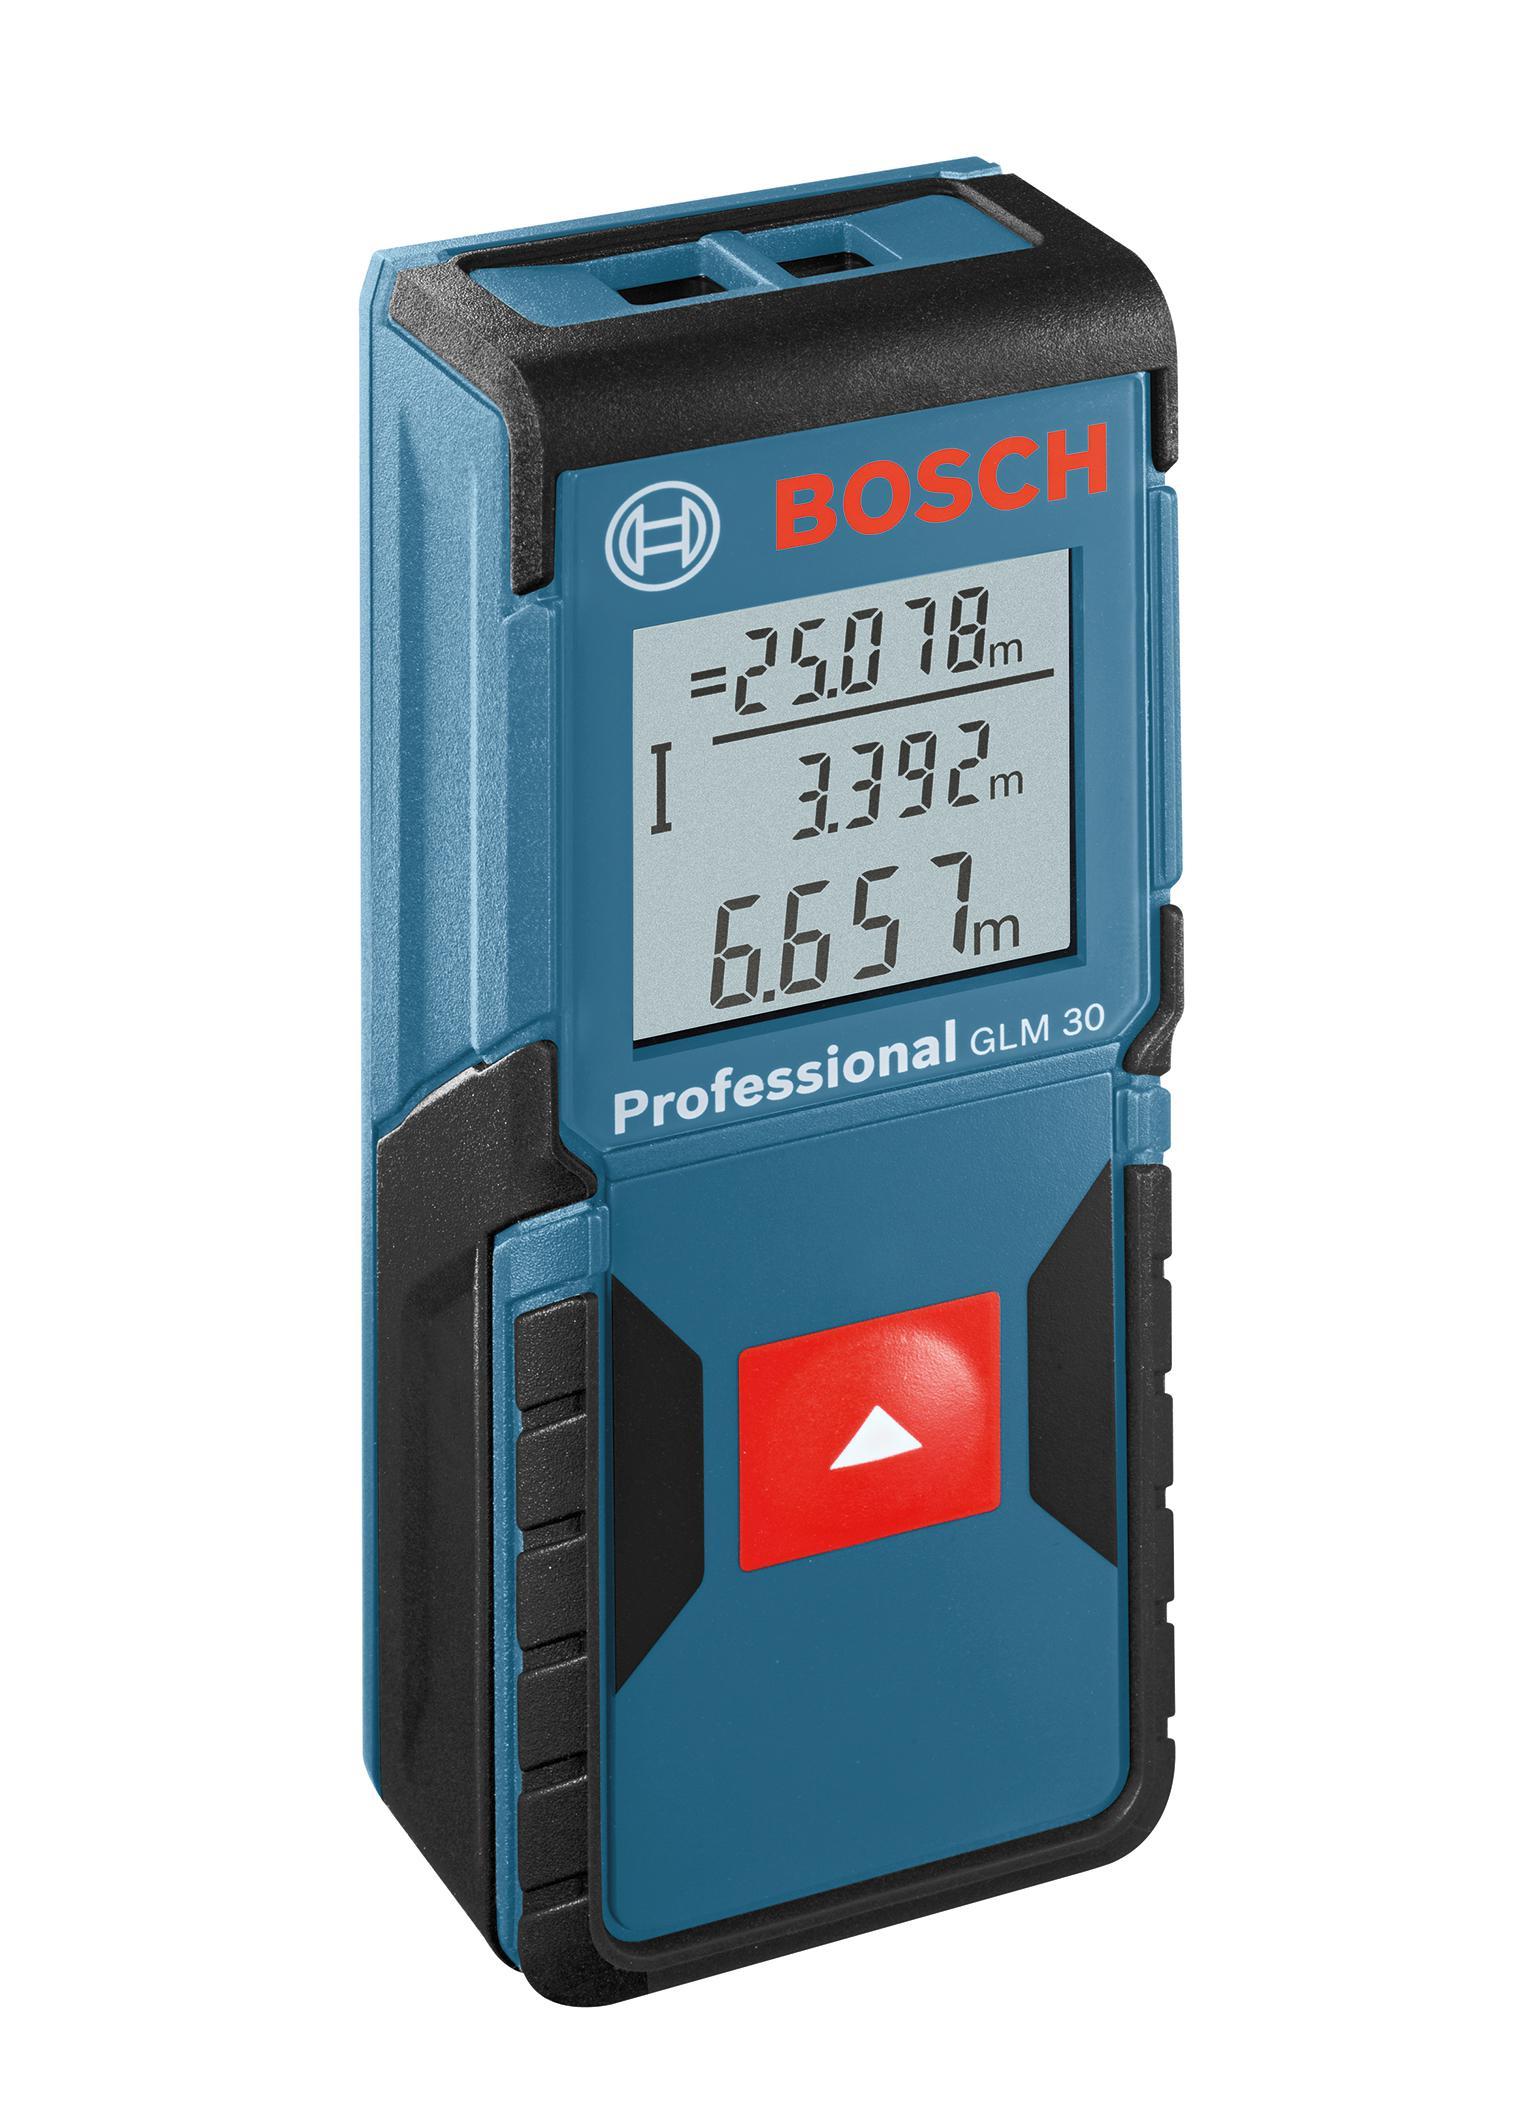 Télémètre Laser Bosch GLM 30 Blue Professional IP54 + ruban mètre 3M offert (avec ODR 20€)